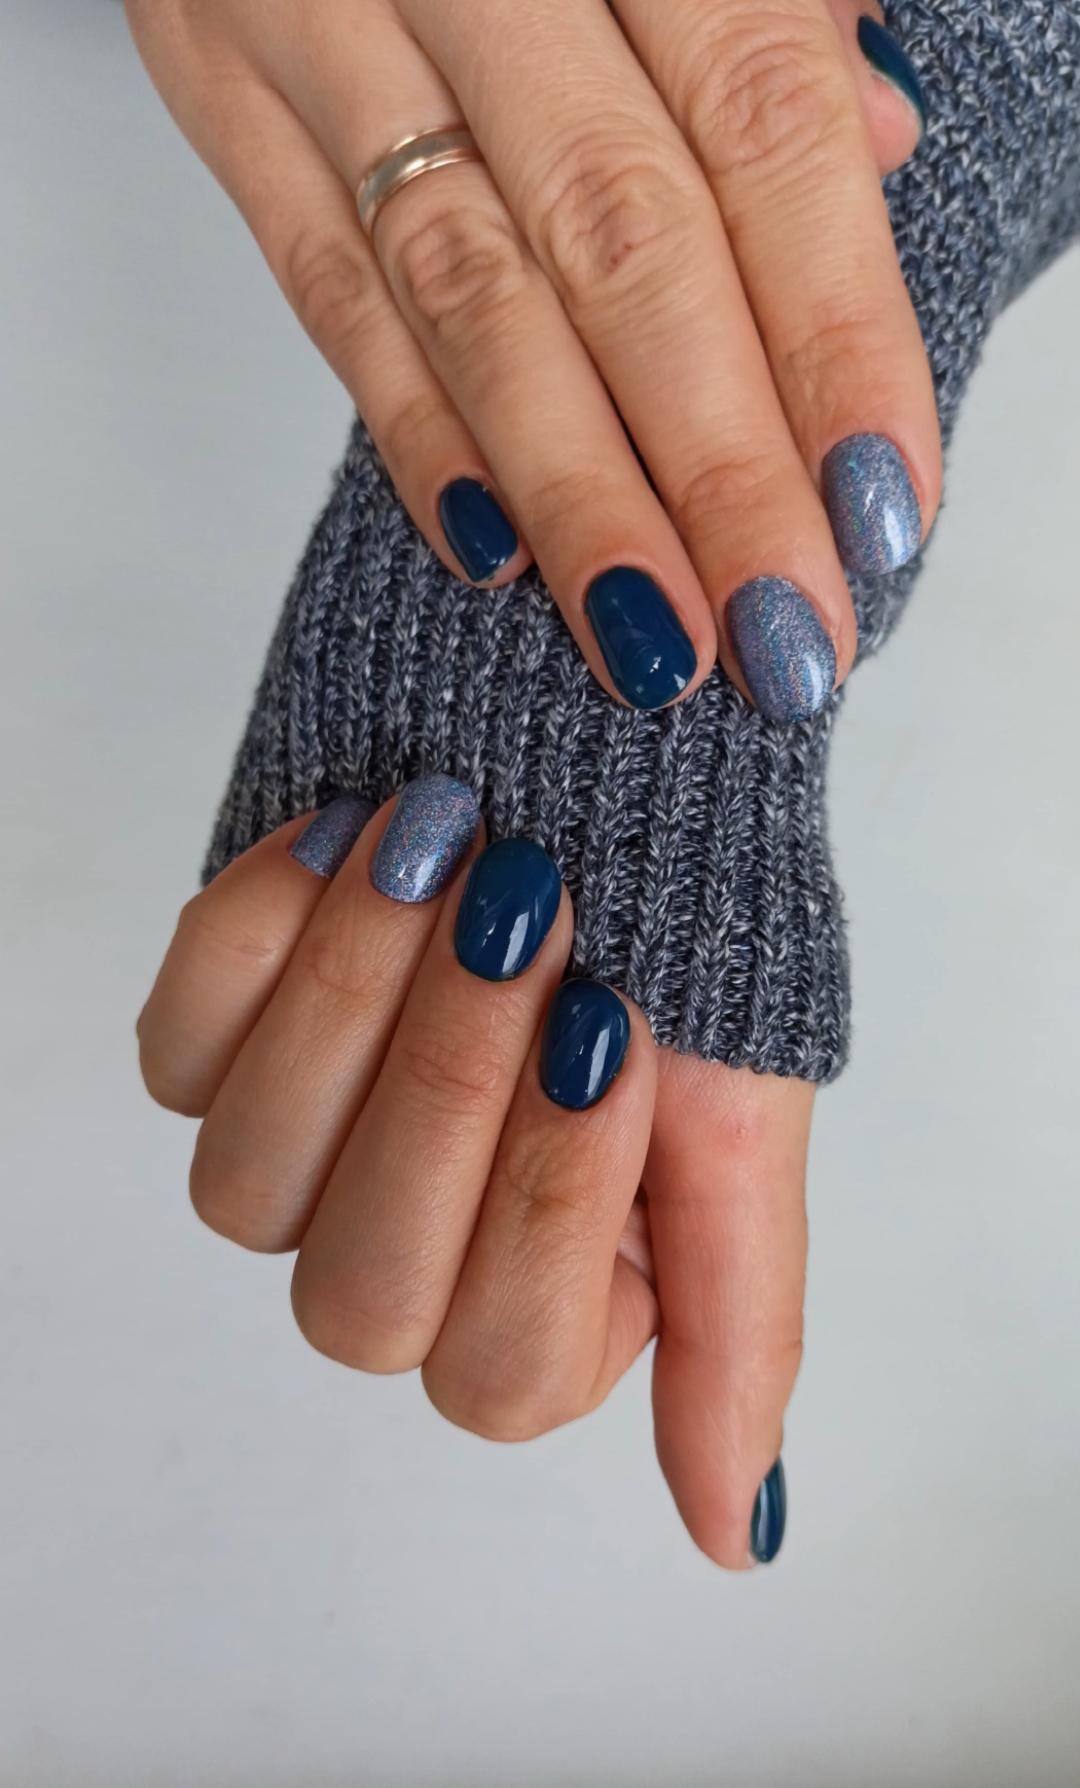 Маникюр с блестками в темно-синем цвете на короткие ногти.